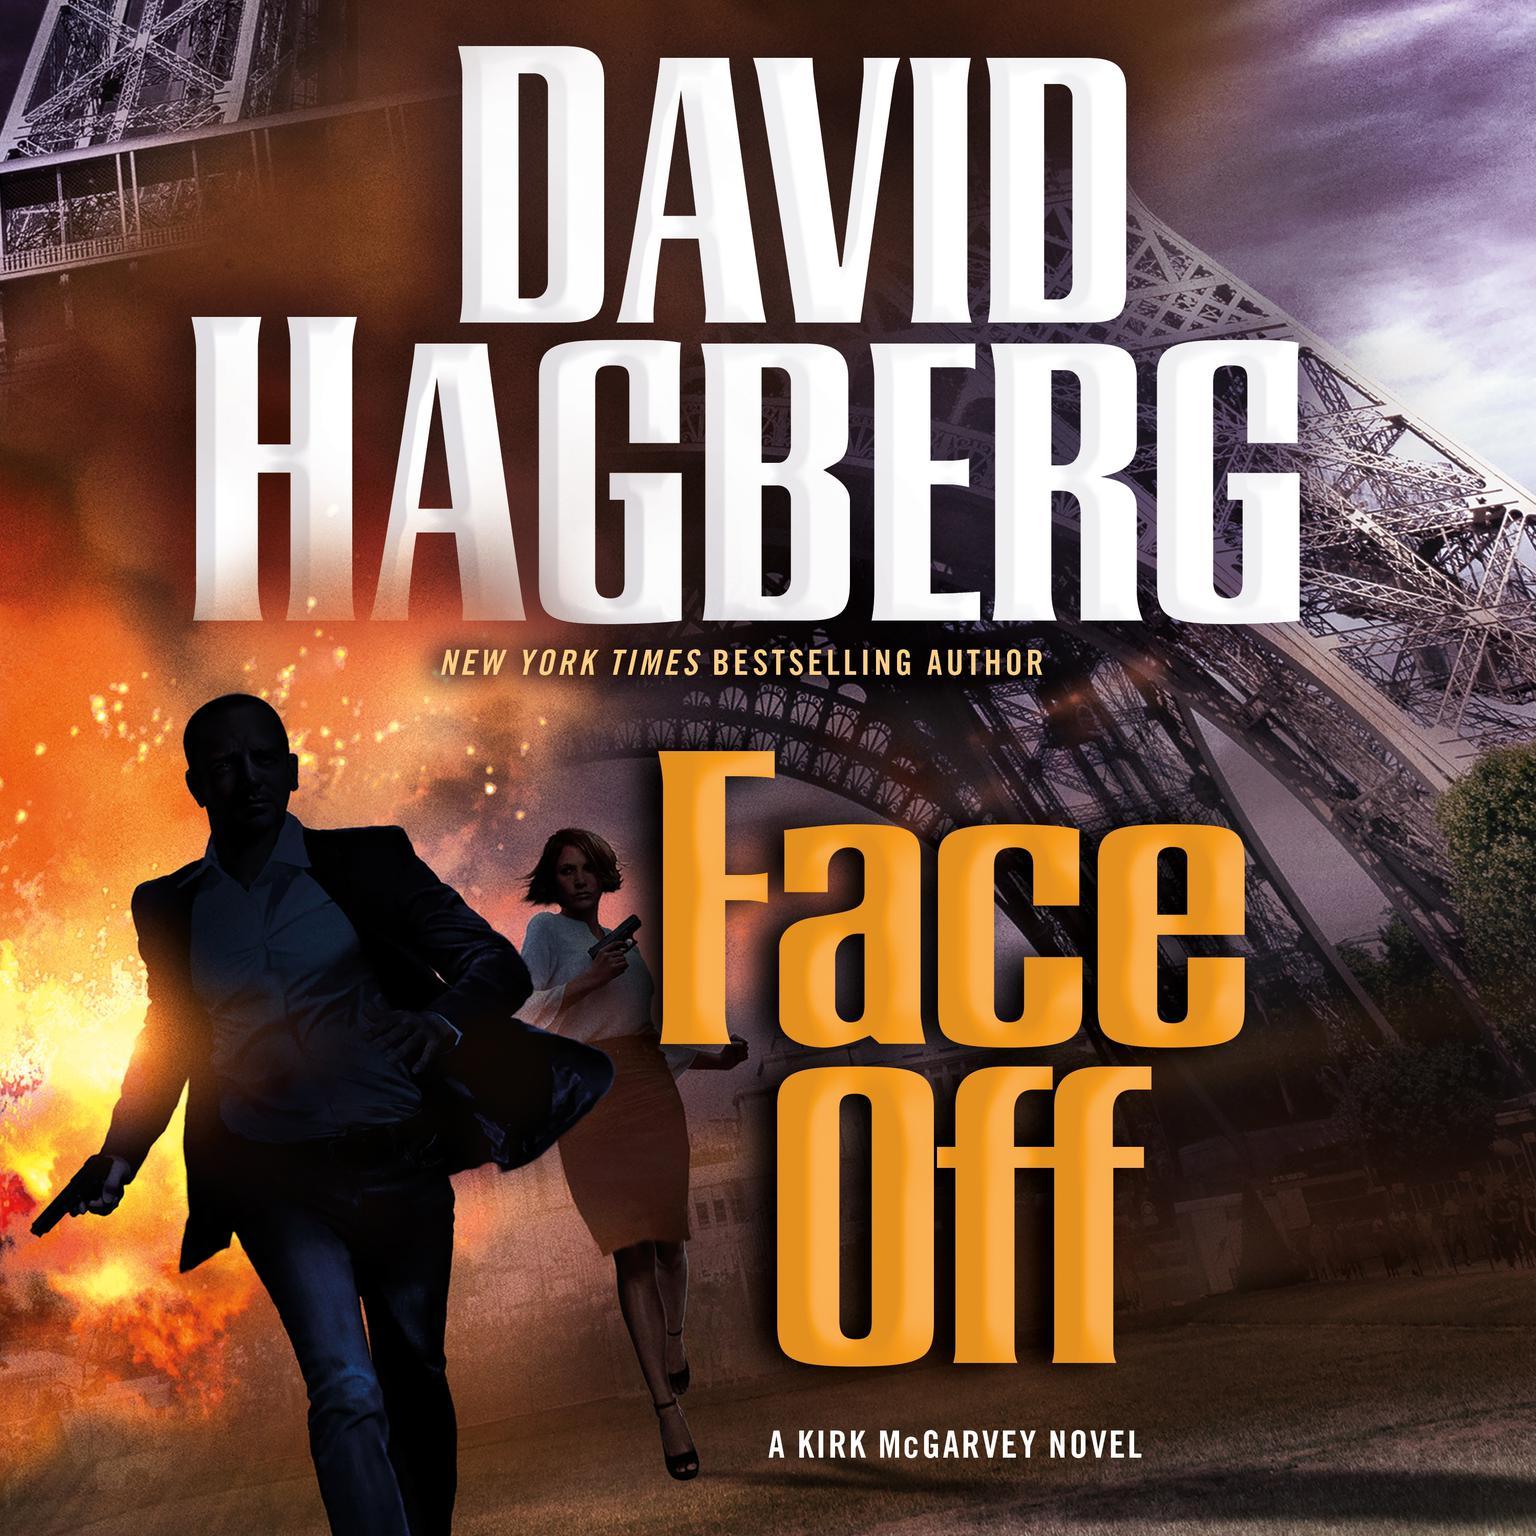 Face Off: A Kirk McGarvey Novel Audiobook, by David Hagberg